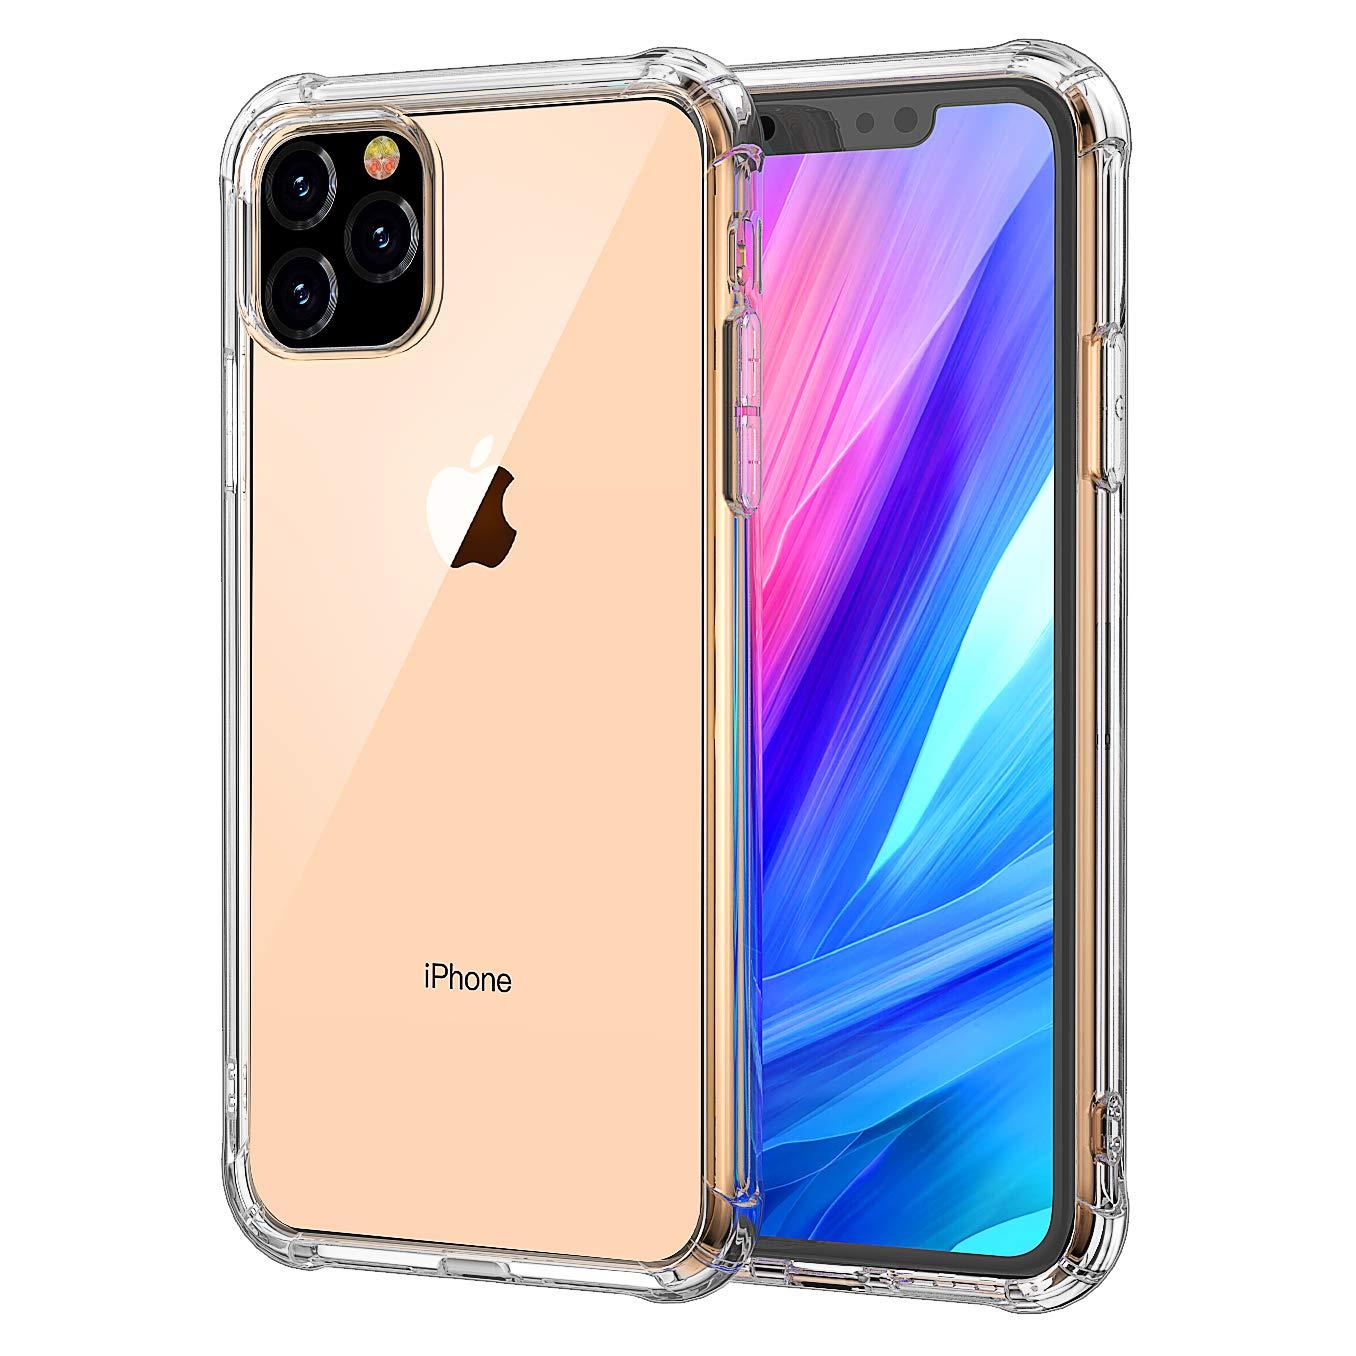 Funda Iphone 11 Pro SMILING [7X82CSZP]